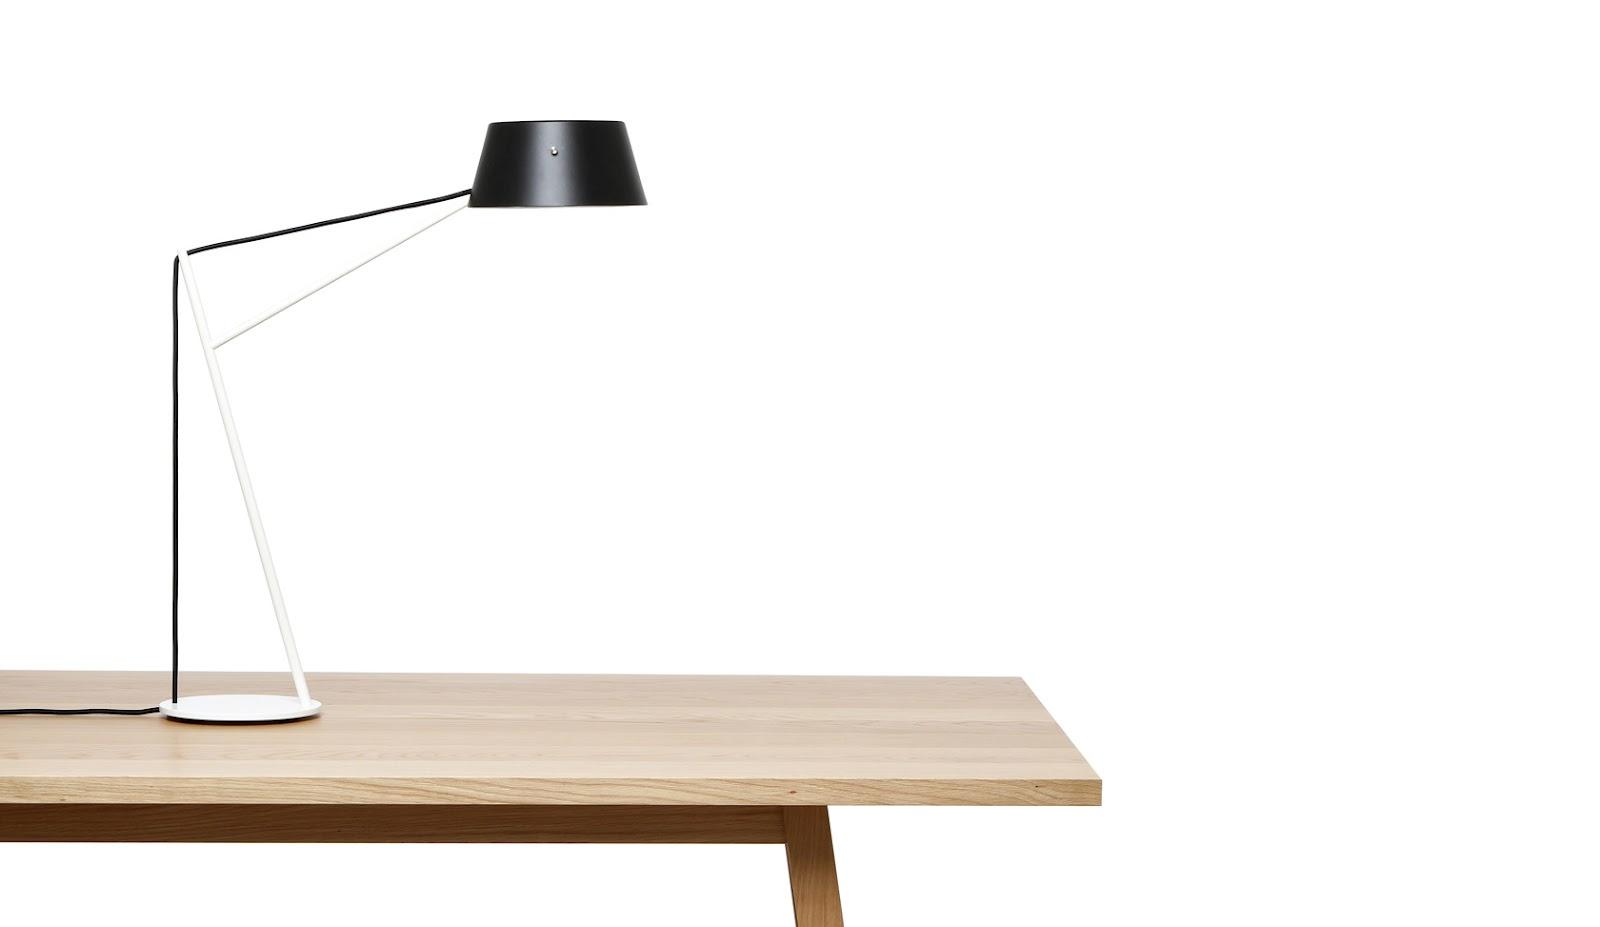 Excellent Desk Lamp Book Light  Magnamail New Zealand